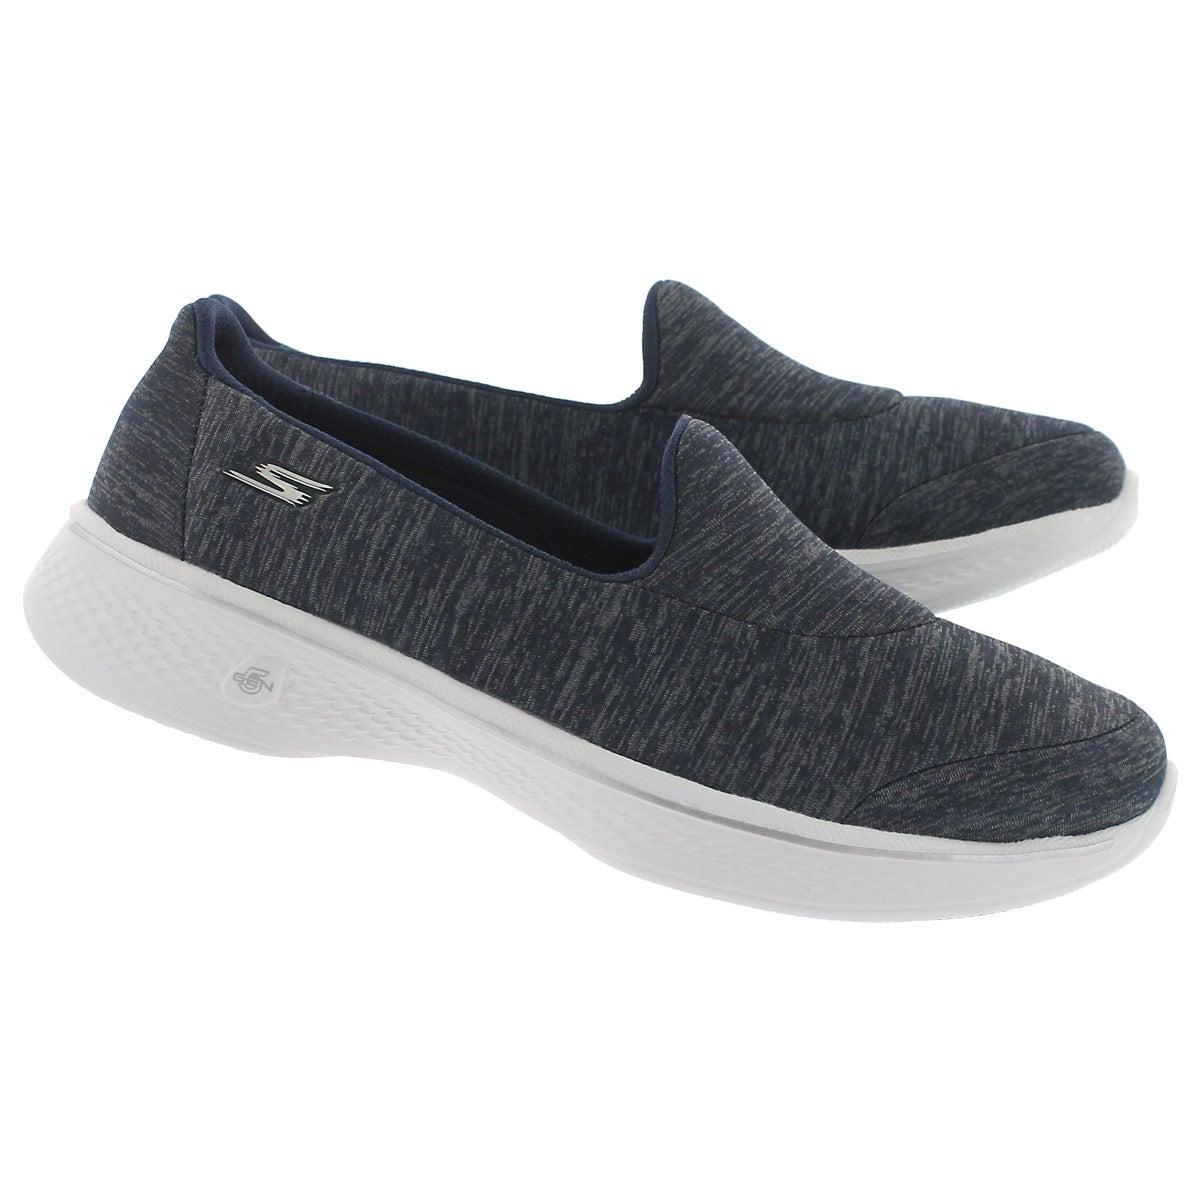 Lds GO Walk 4 Astonish navy walking shoe